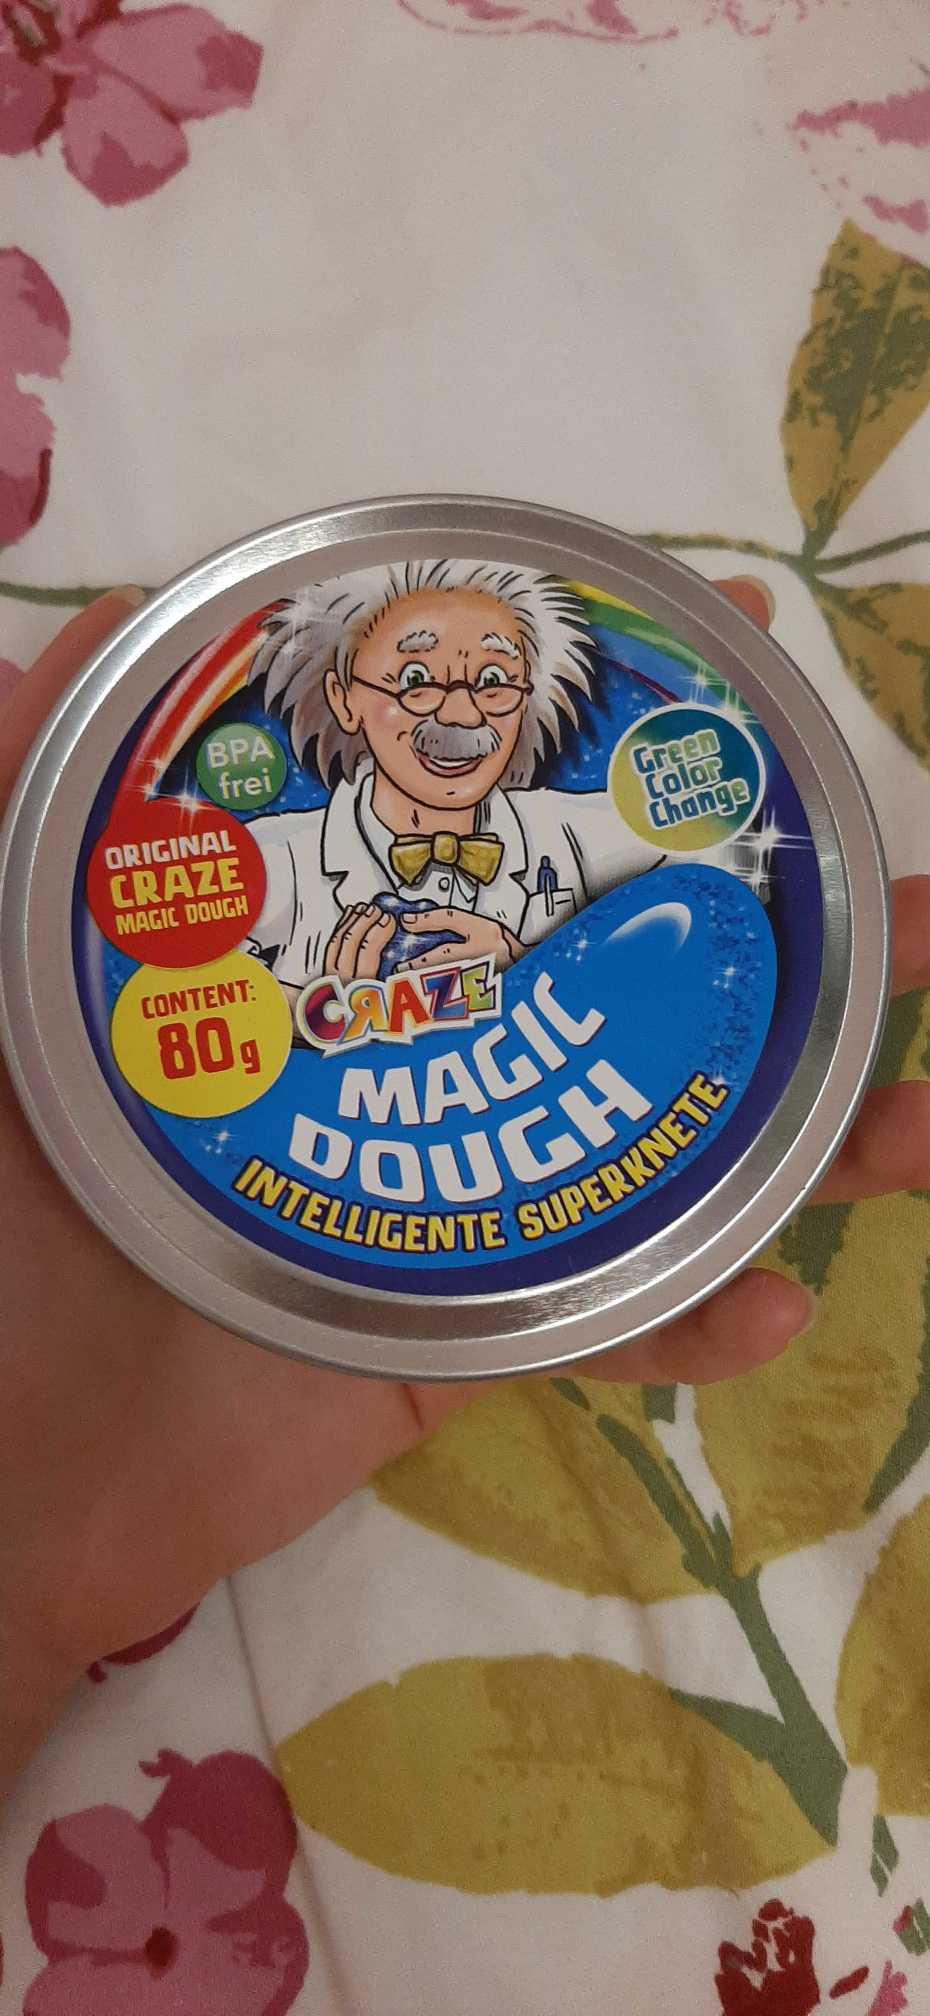 Magic Dough intelligente superknete